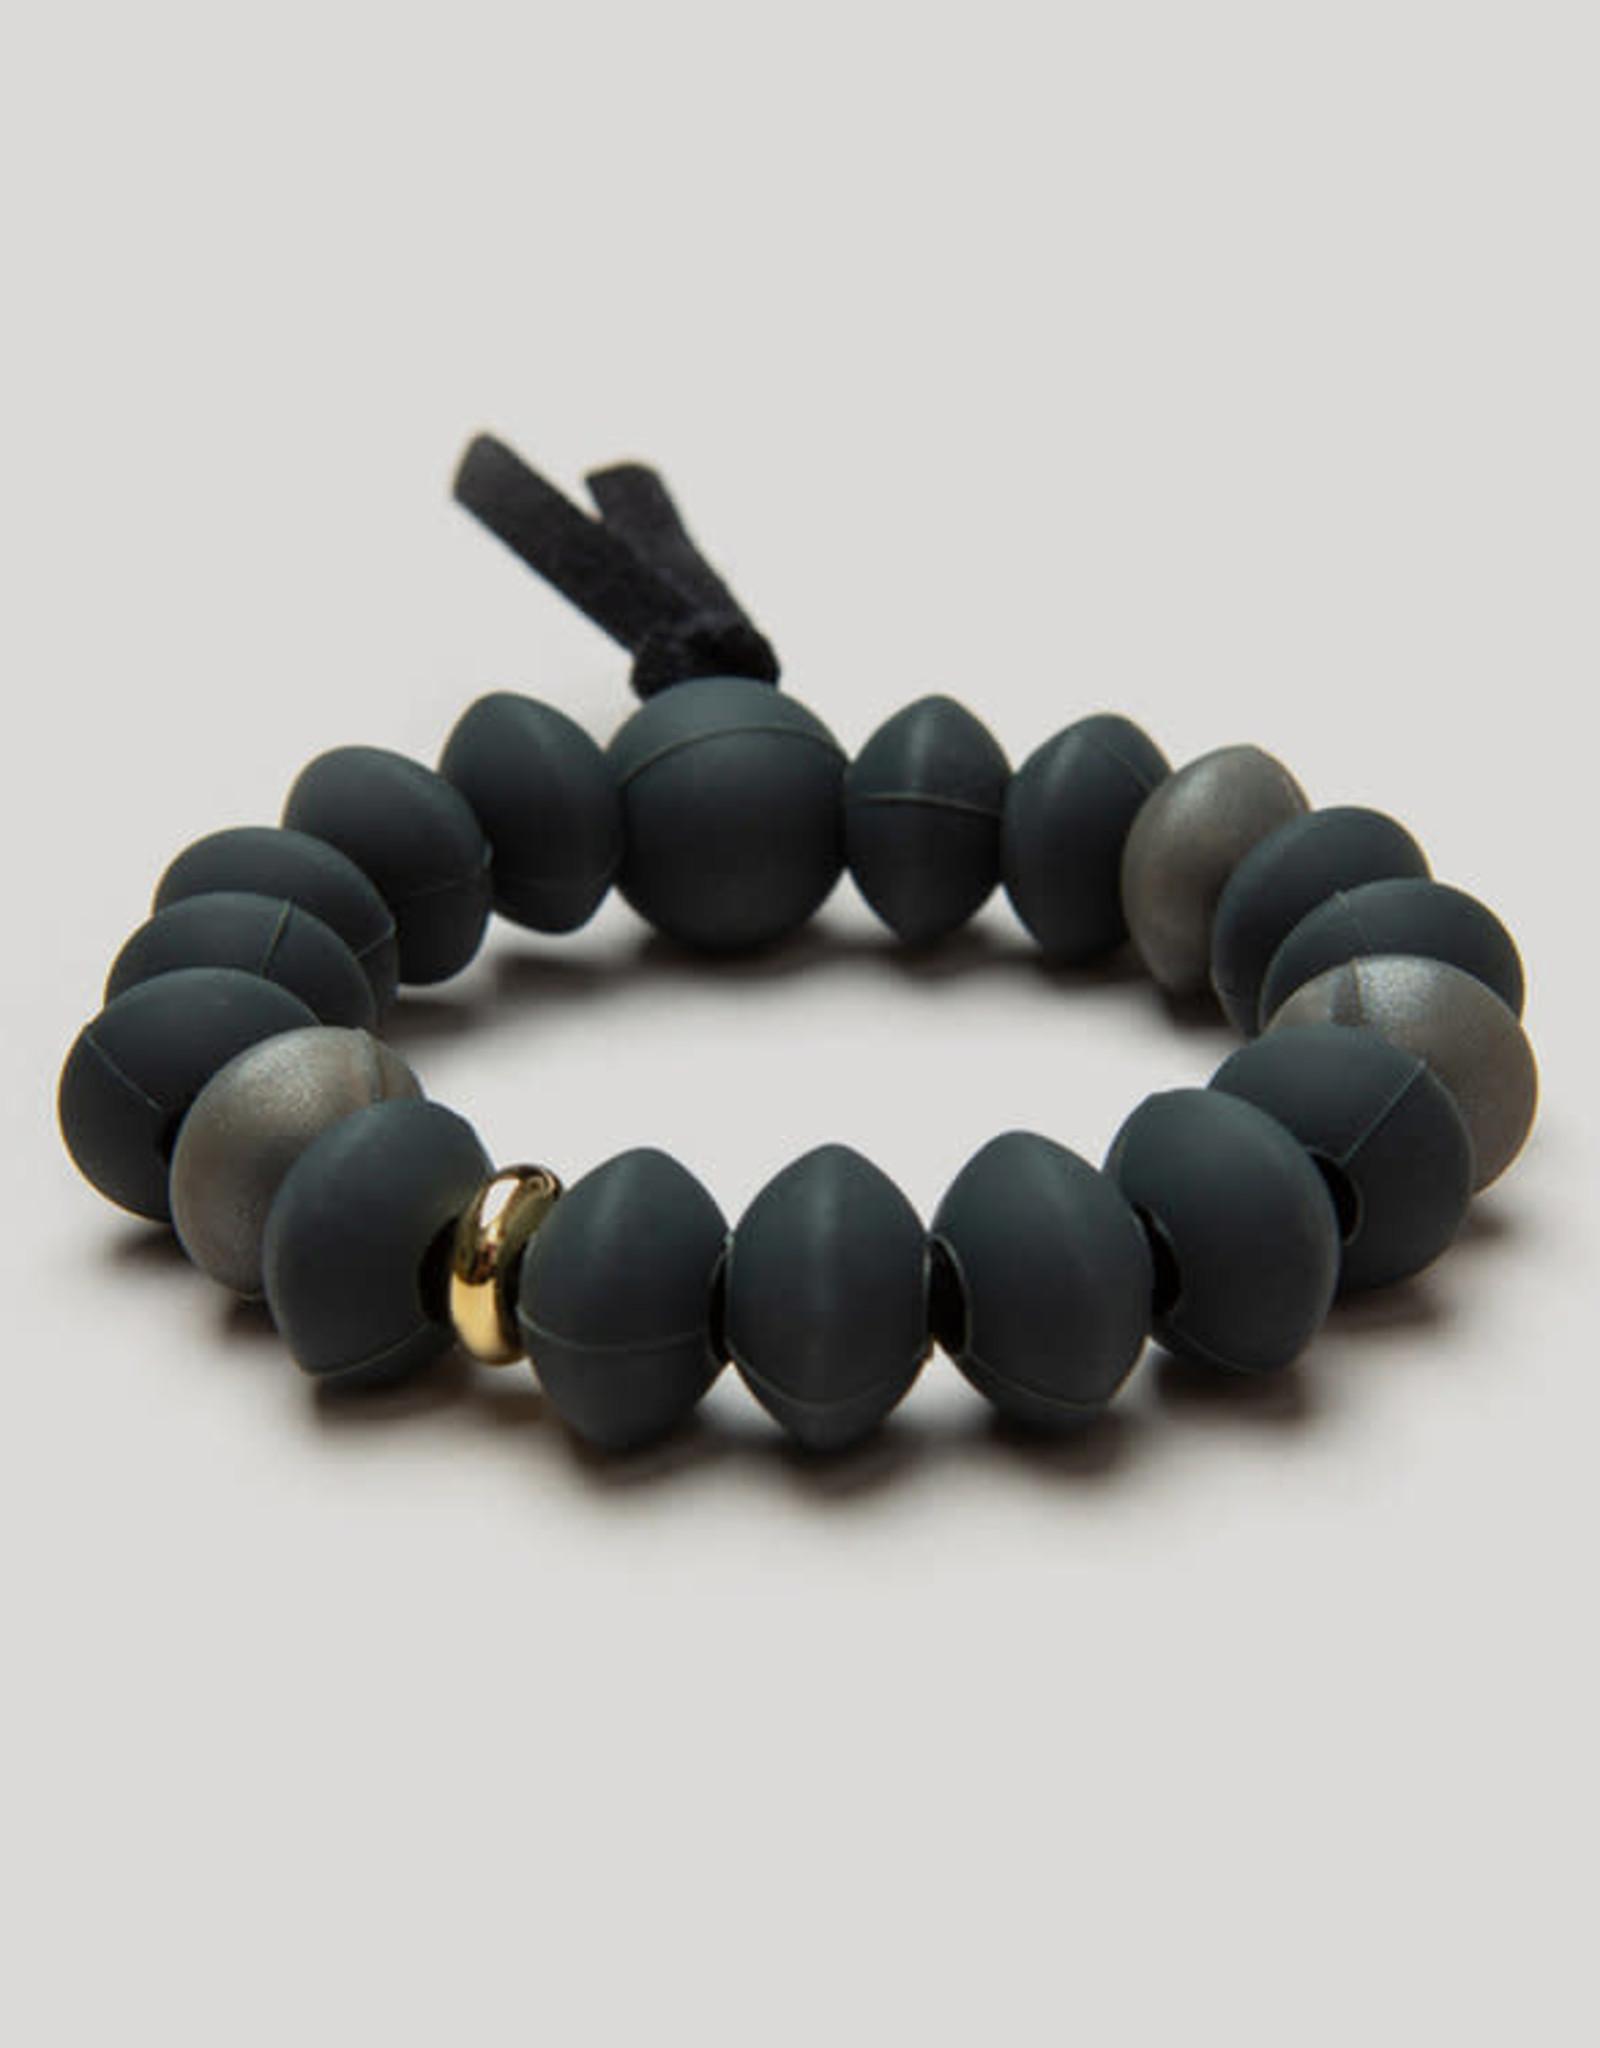 Charcoal Teething Bracelet - Small